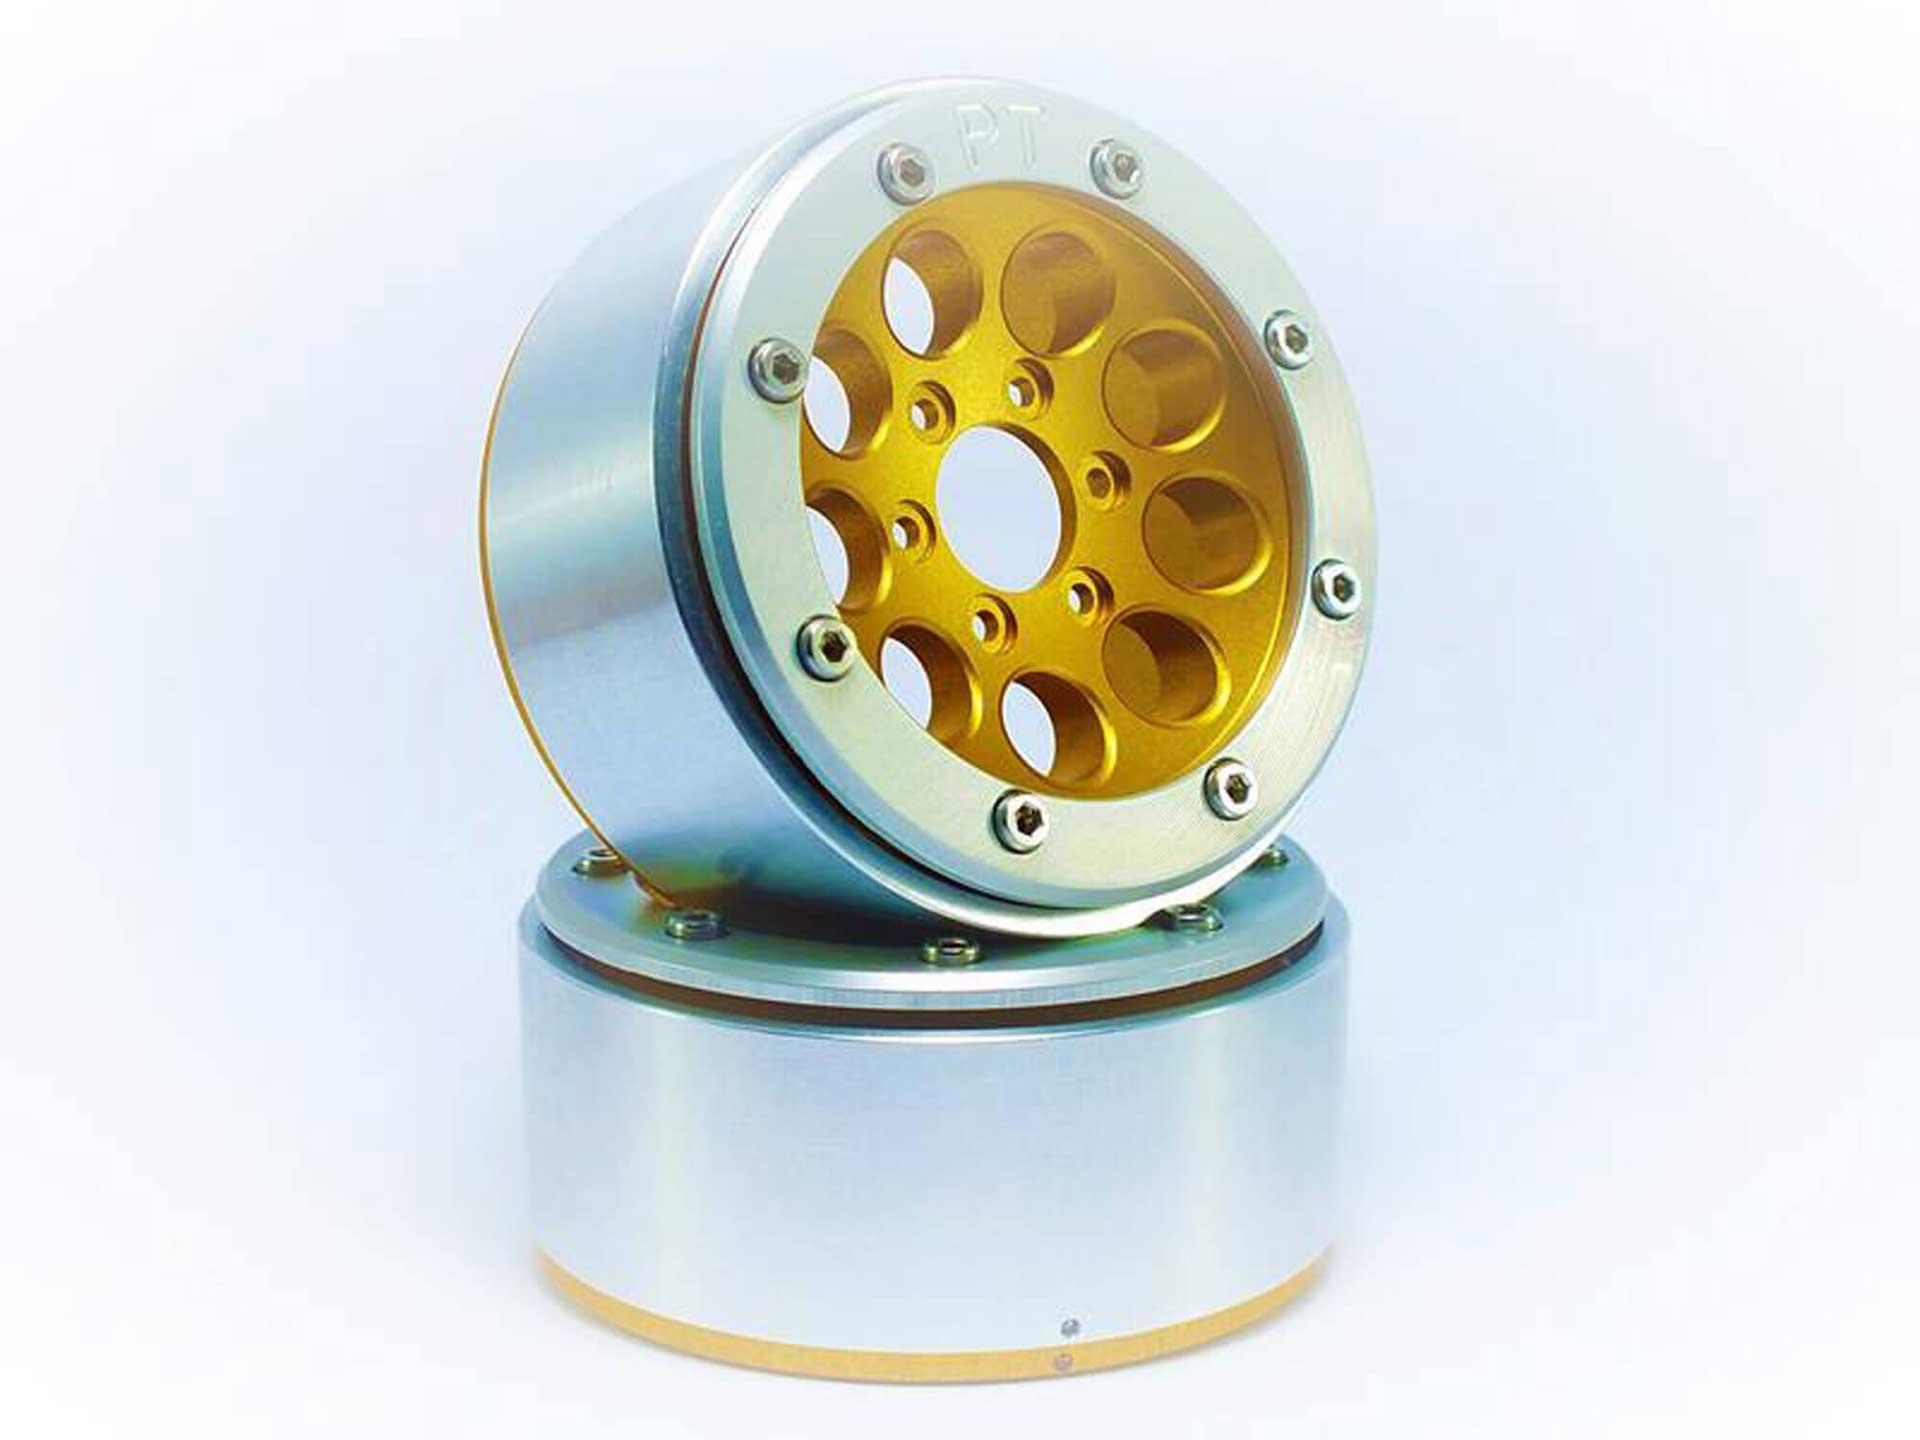 Metsafil Beadlock Wheels GUN gold/silber 1.9 (2 St.) ohne Radnabe